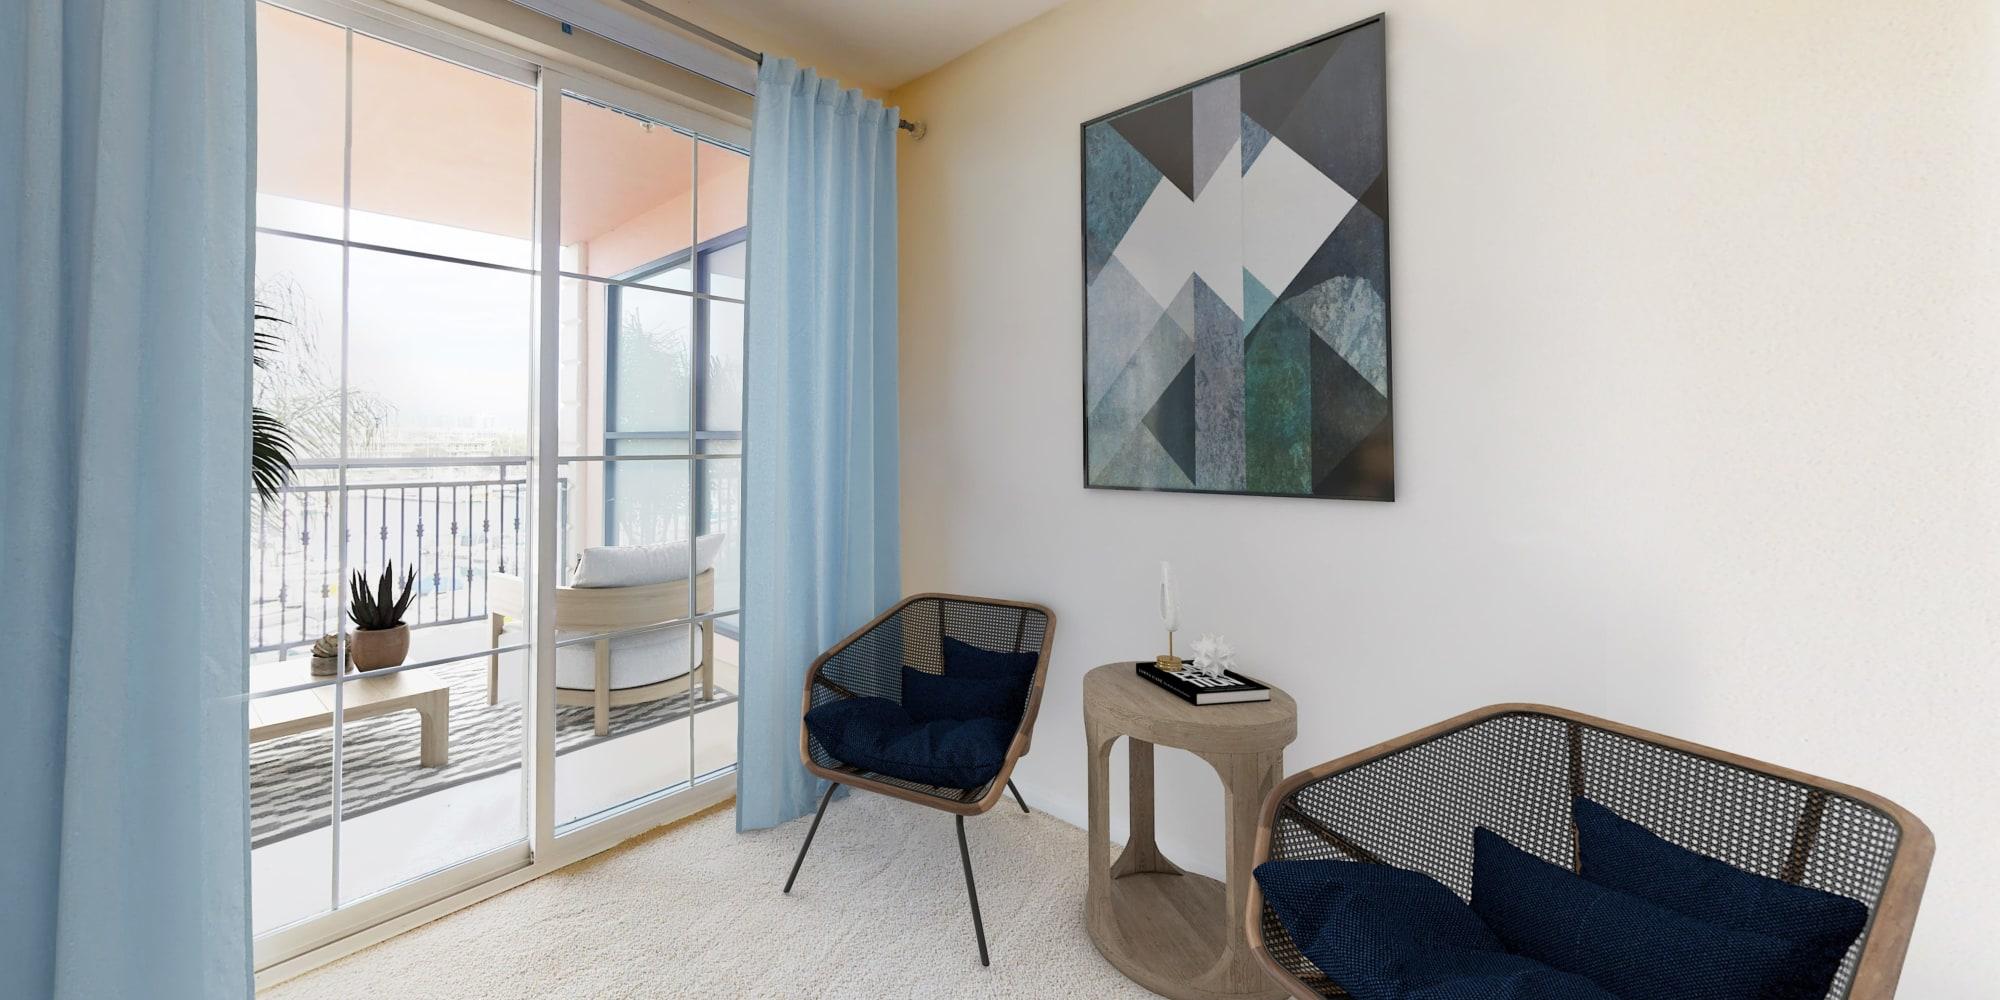 Sitting area inside large bedroom and balcony overlooking the marina at The Villa at Marina Harbor in Marina del Rey, California